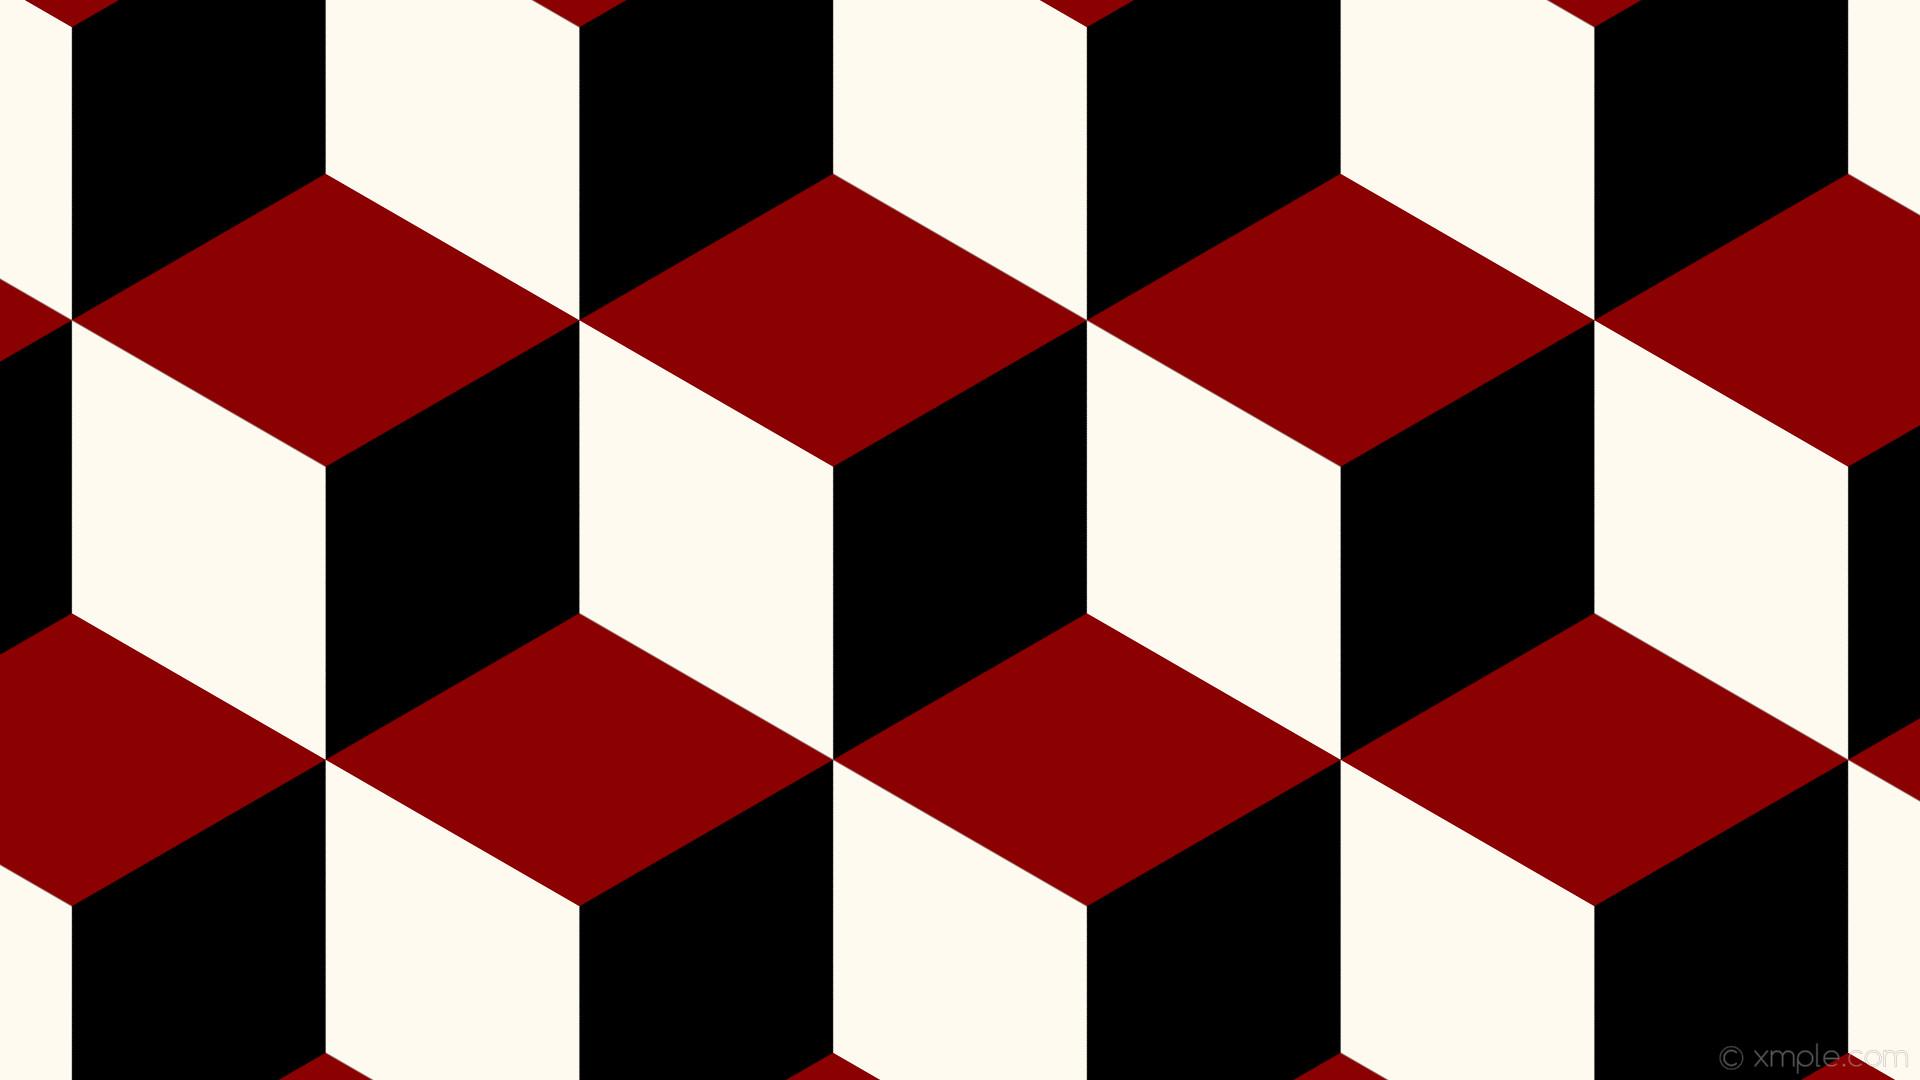 wallpaper red 3d cubes white black dark red floral white #000000 #8b0000  #fffaf0